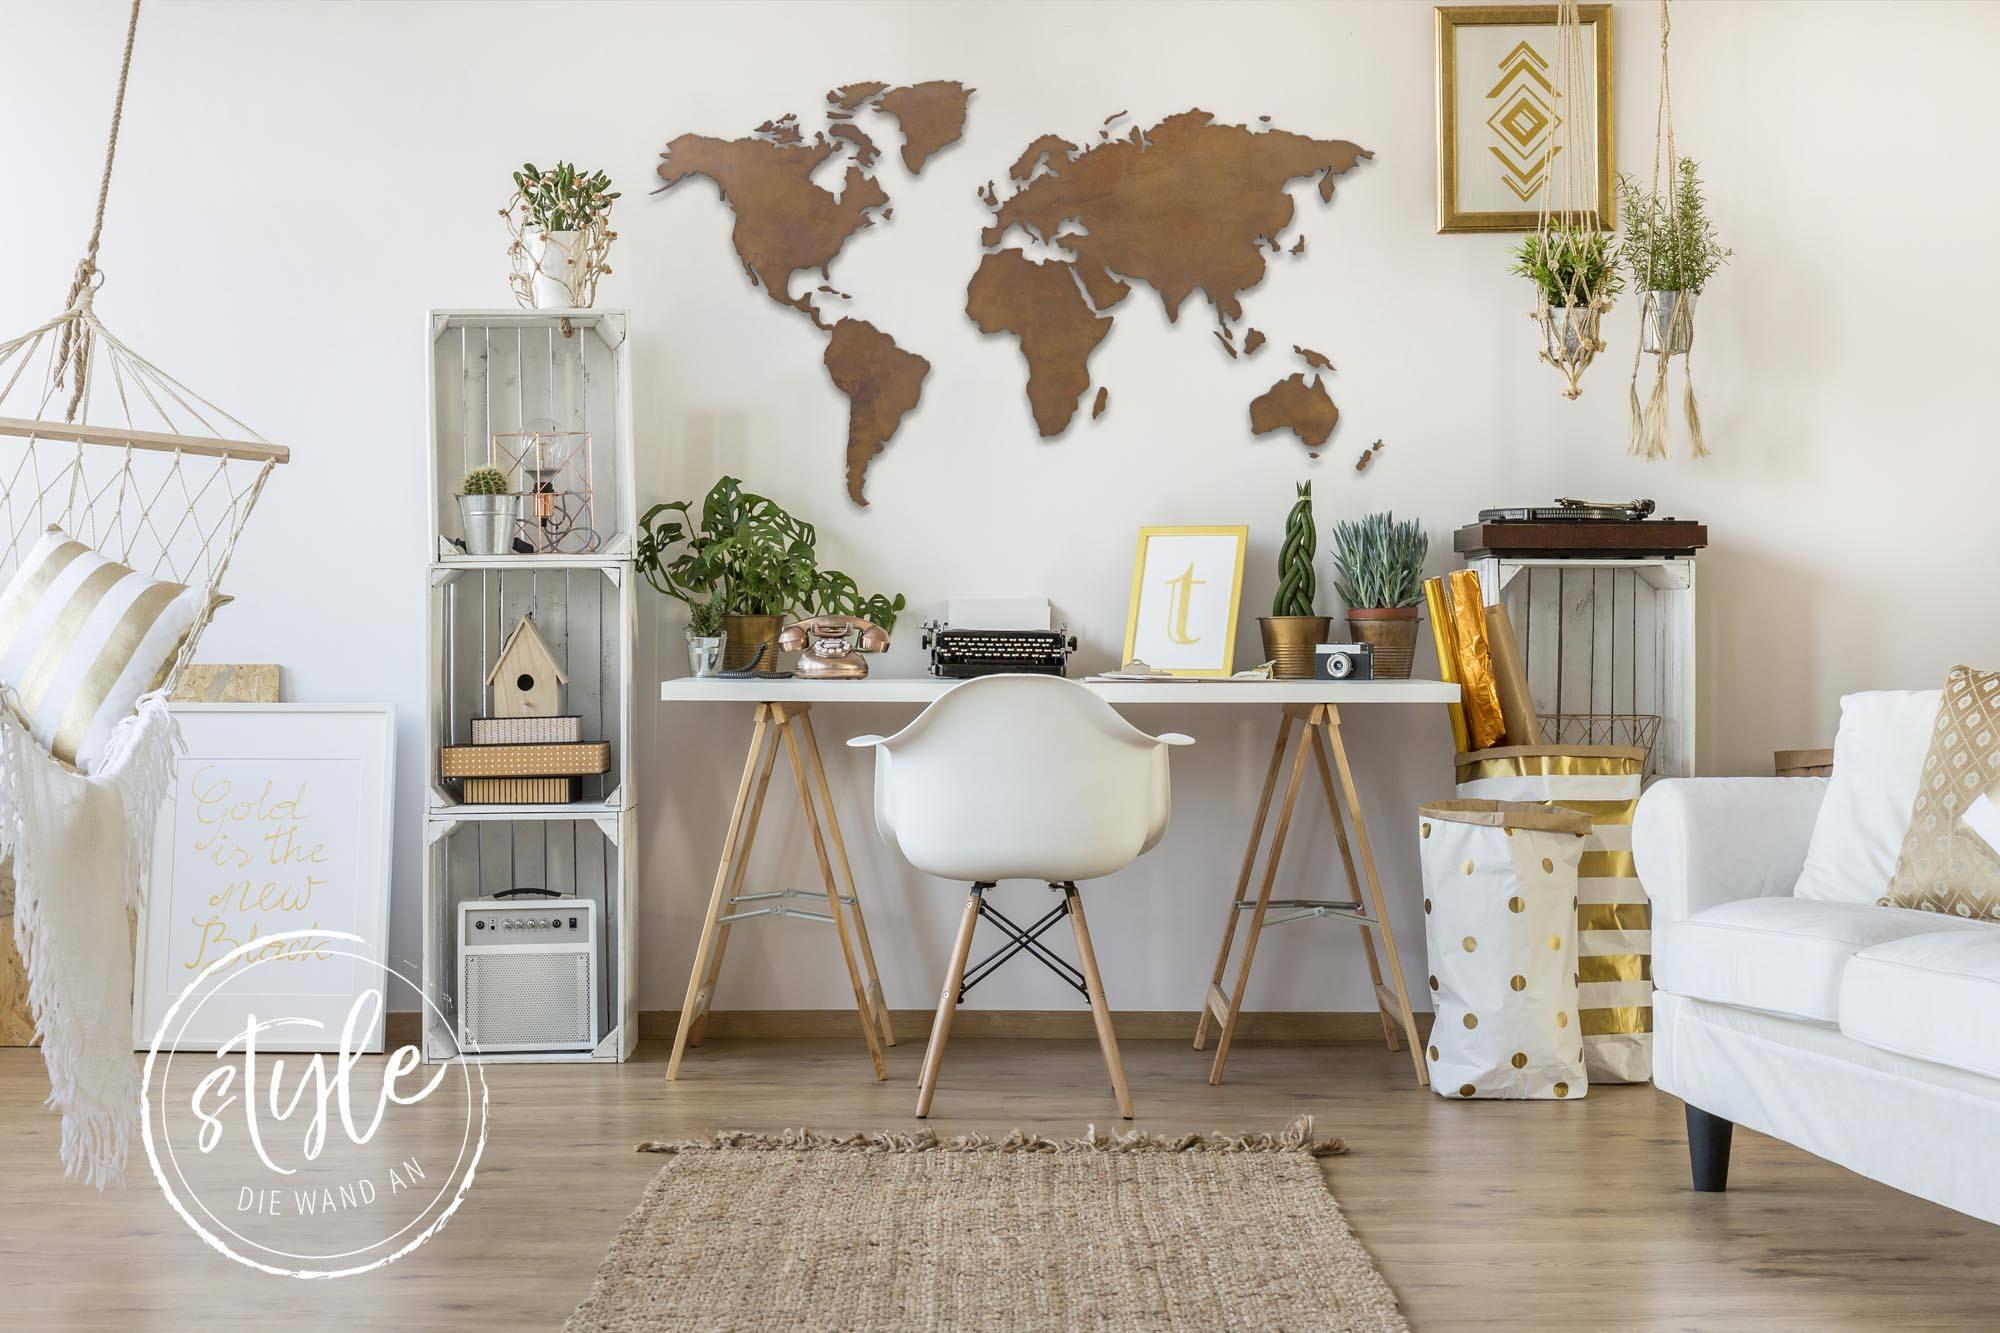 Wanddekoration • Wandbilder der Weltkarte